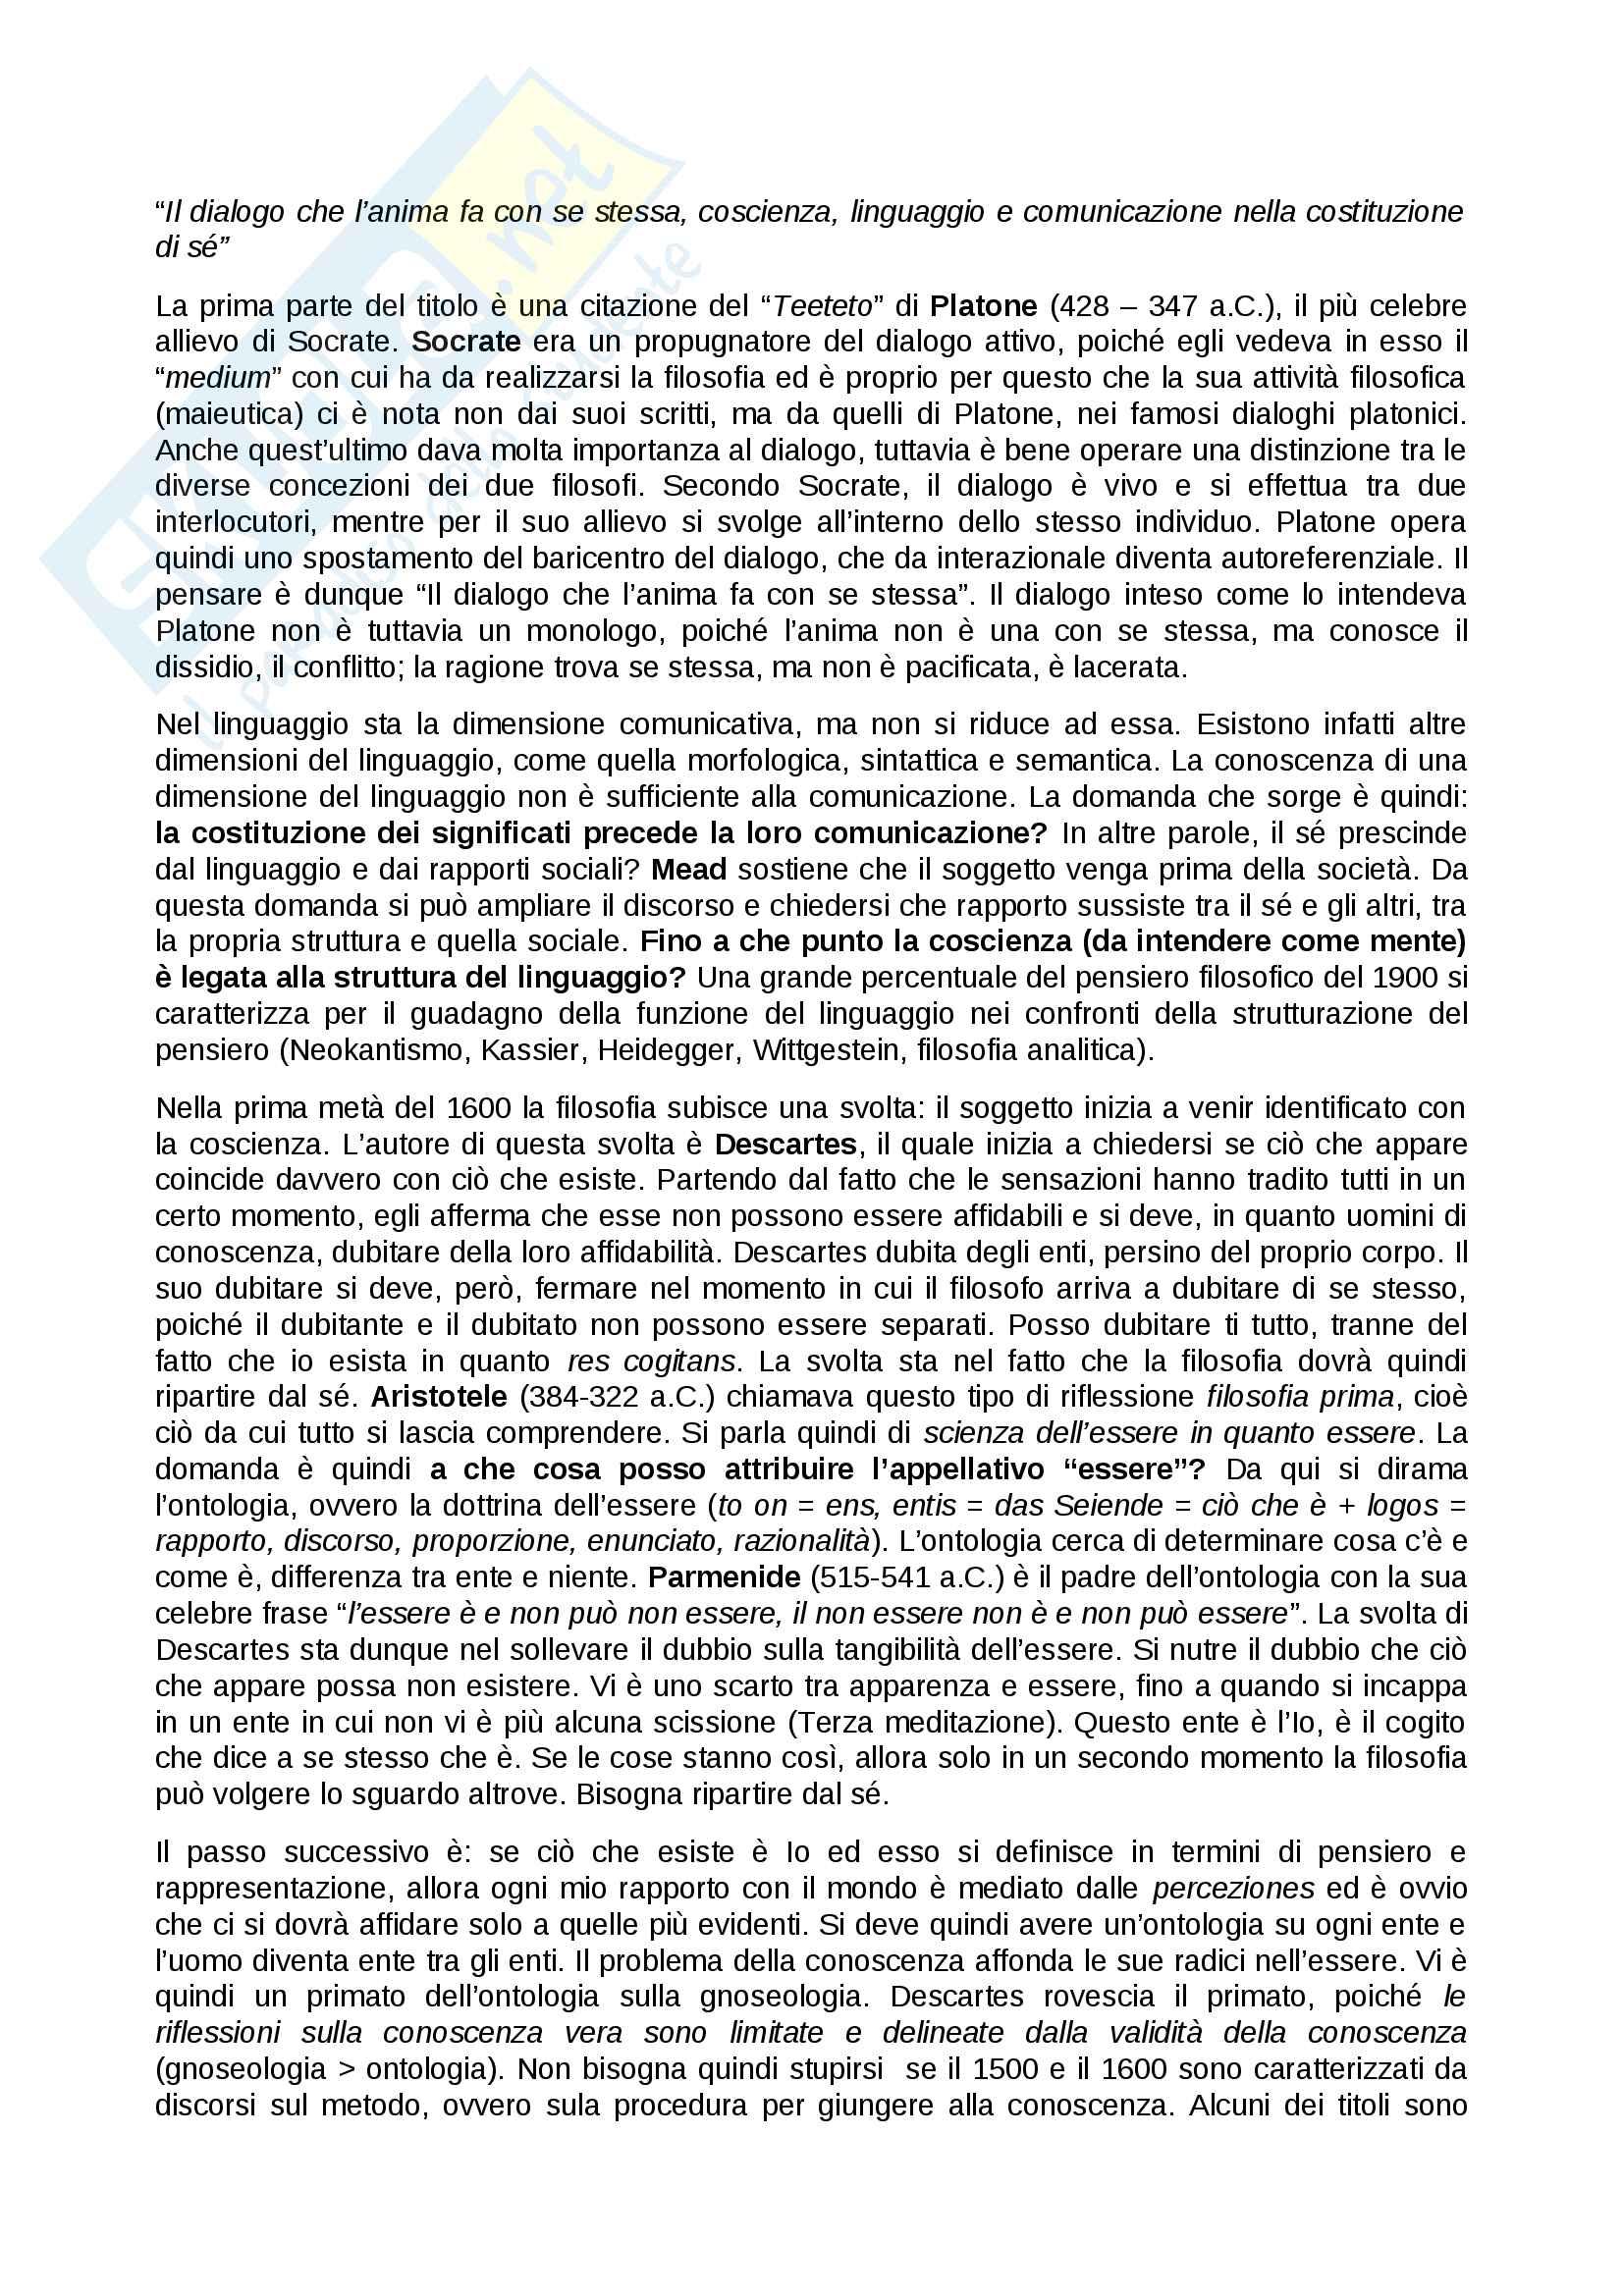 Panoramica Gnoseologia, Gnoseologia, Socrate - Platone - Aristotele - Descartes - Leibniz - Heidegger